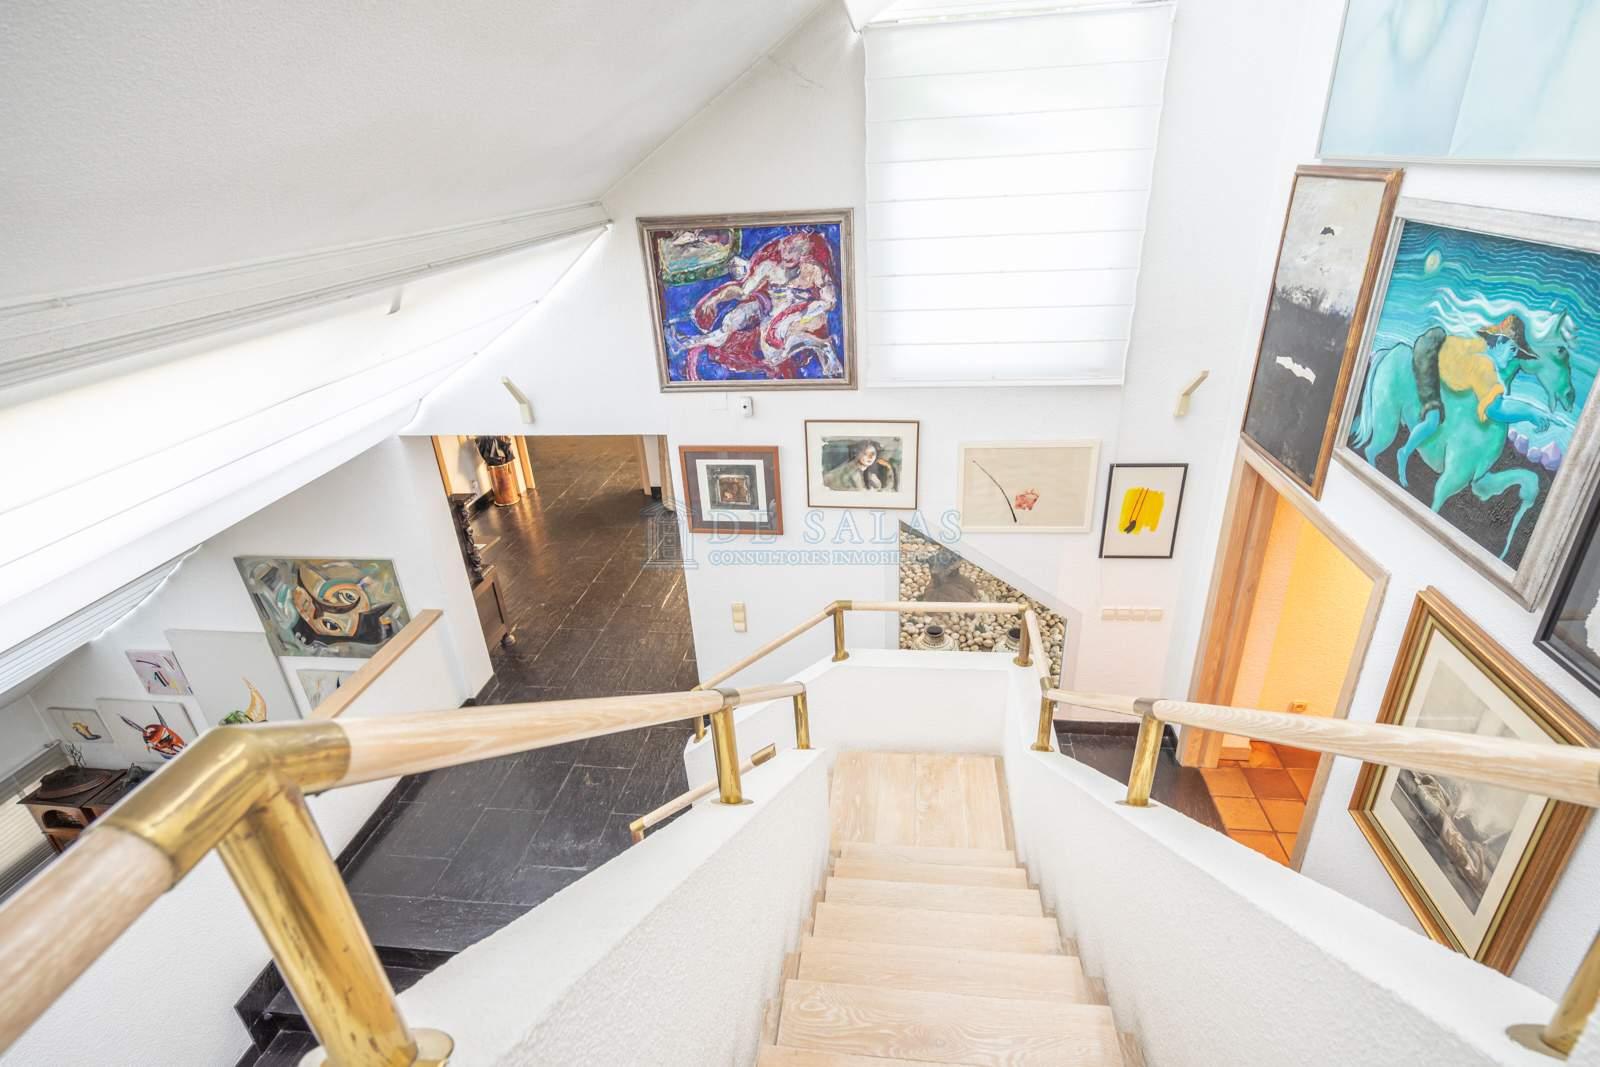 Escalera-44 House La Moraleja